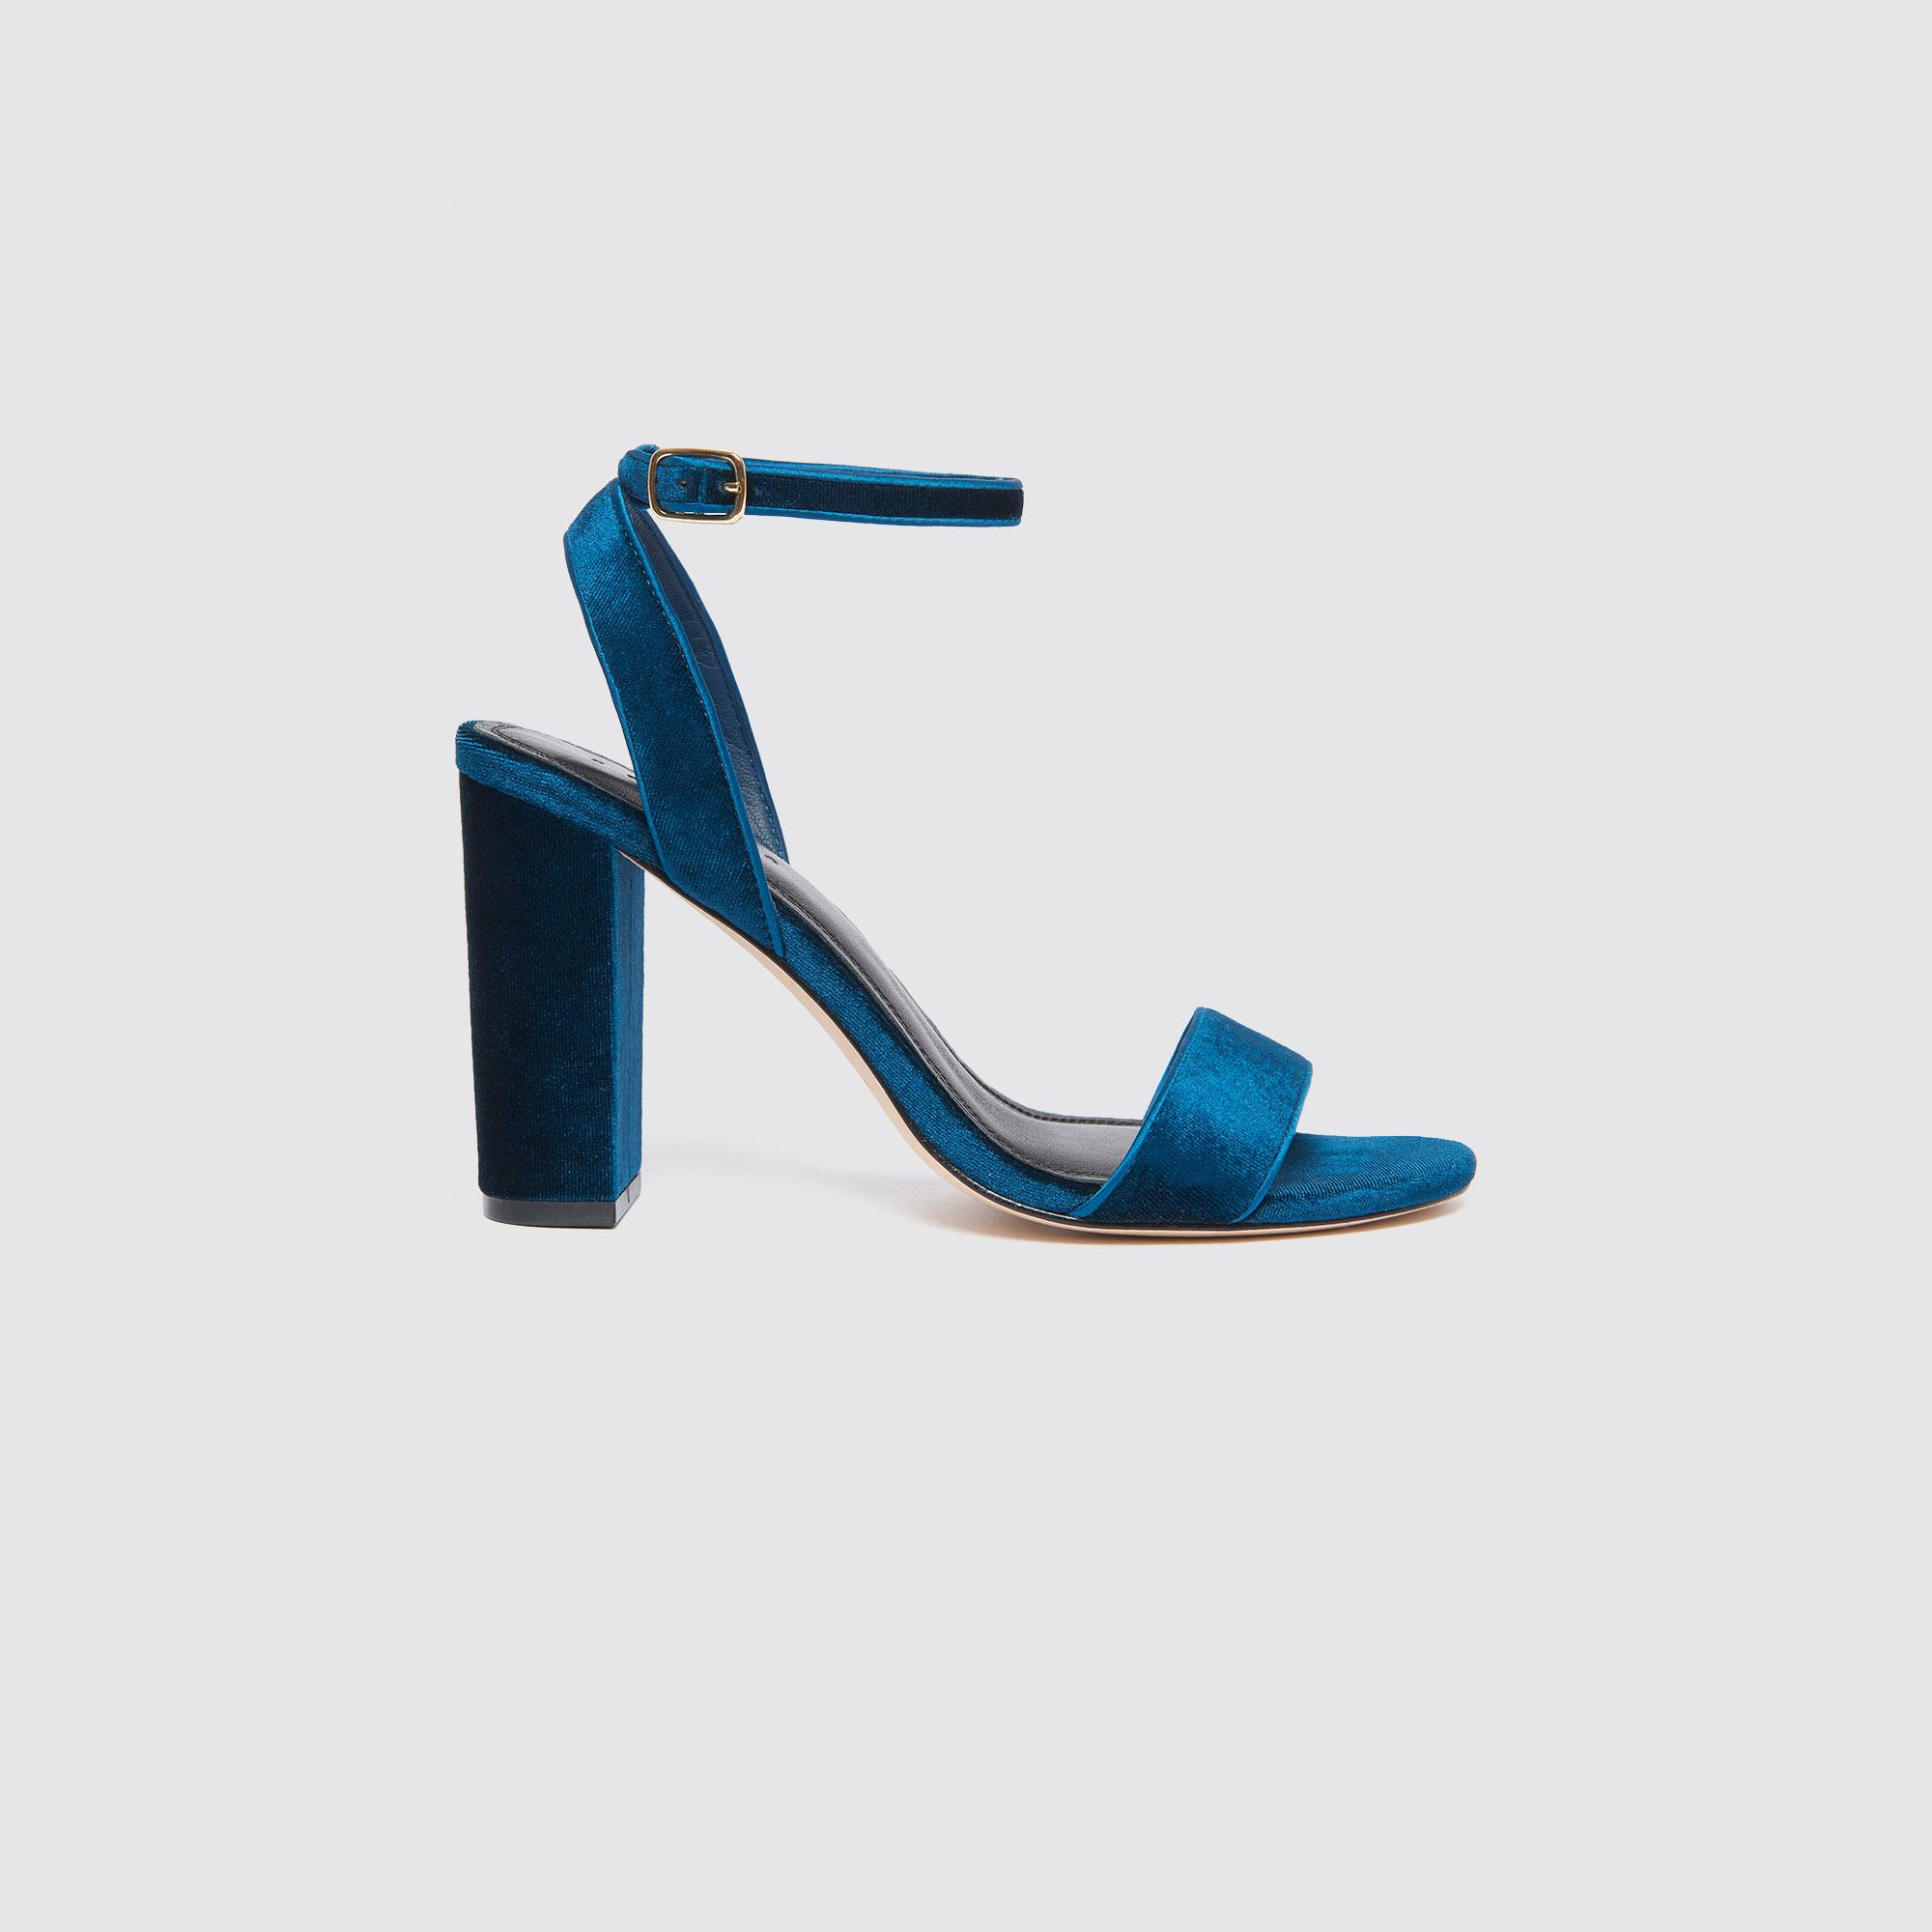 ce5243f30660a Velvet heeled sandals   Sandals color Turquoise ...